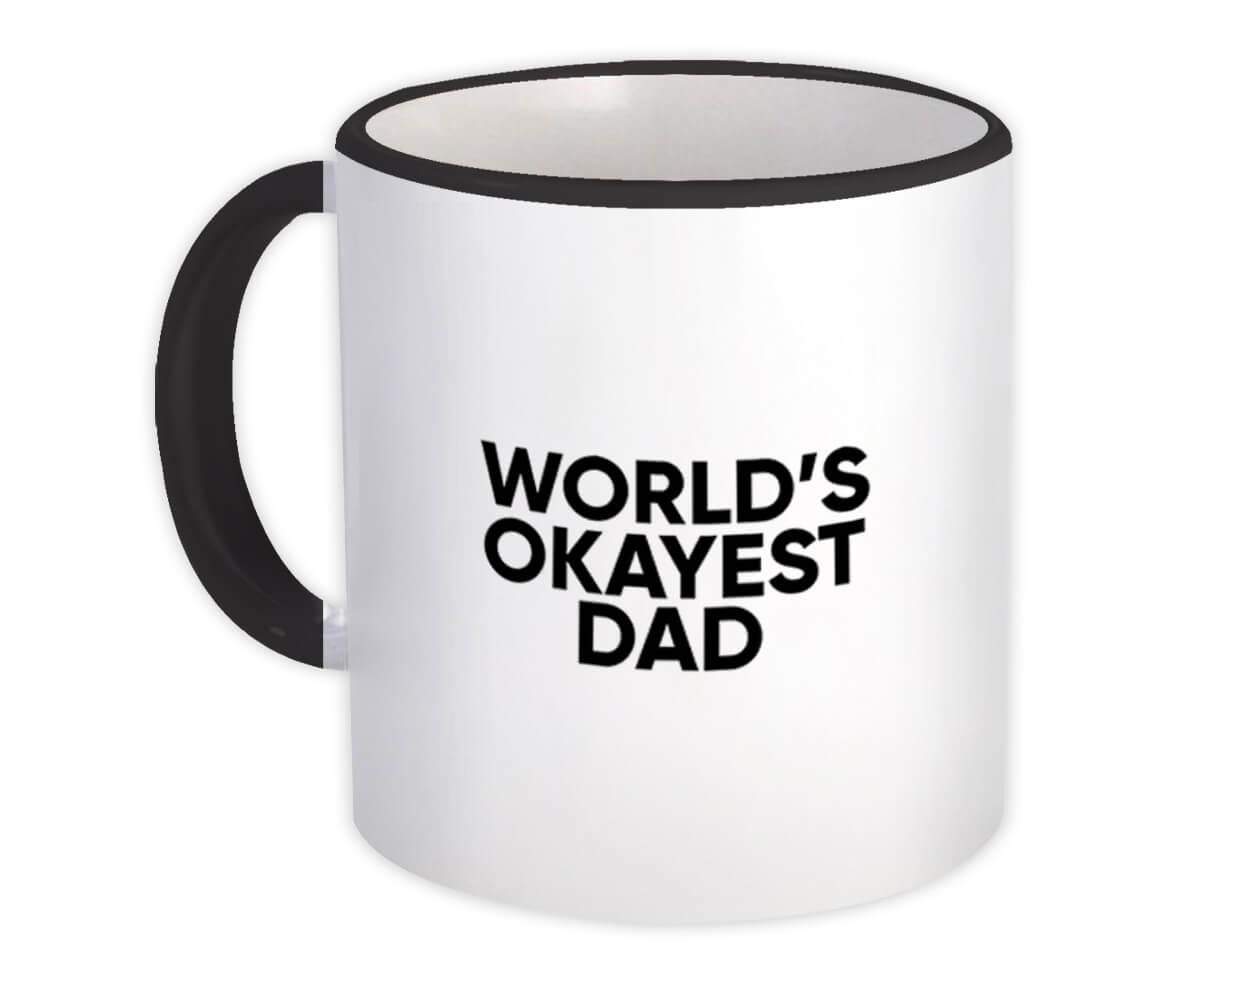 Worlds Okayest DAD : Gift Mug Text Family Work Christmas Birthday Father